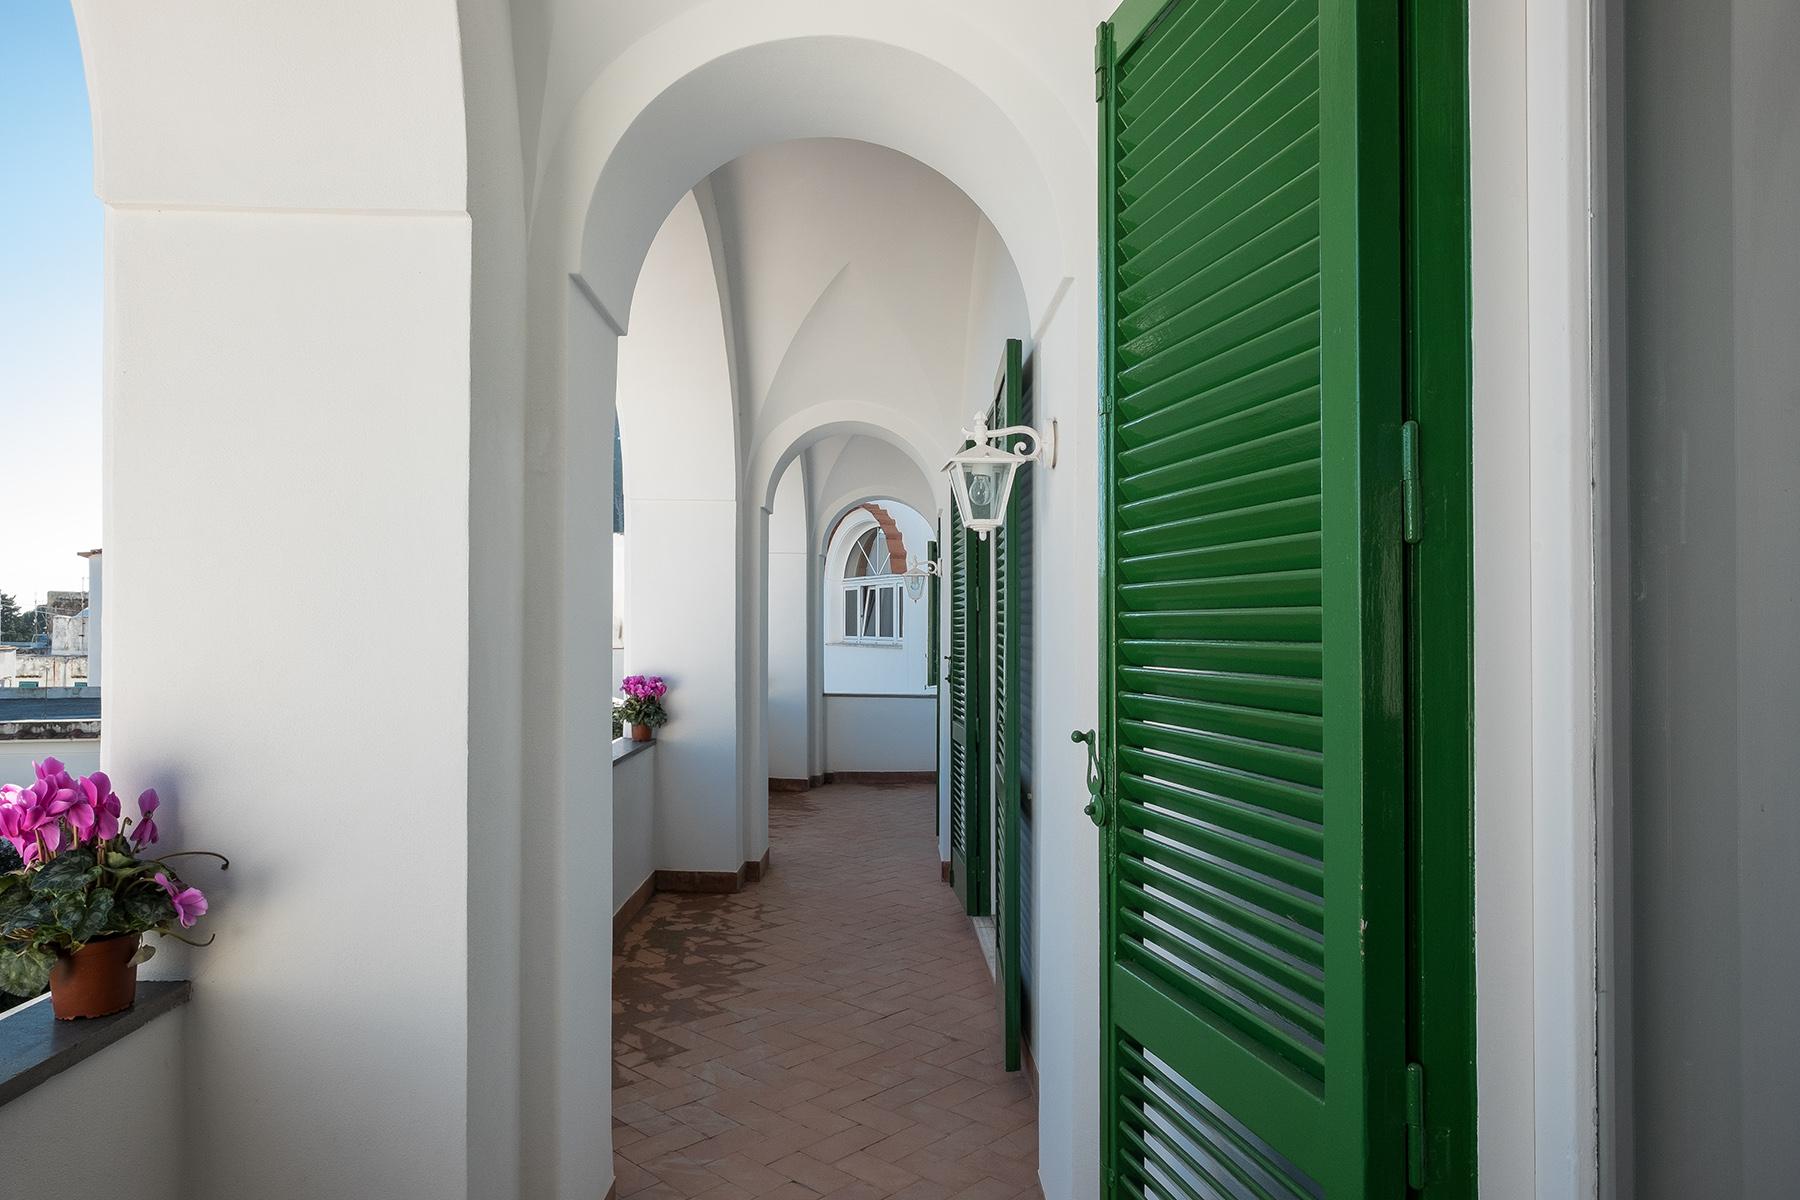 Casa indipendente in Vendita a Capri: 5 locali, 400 mq - Foto 19